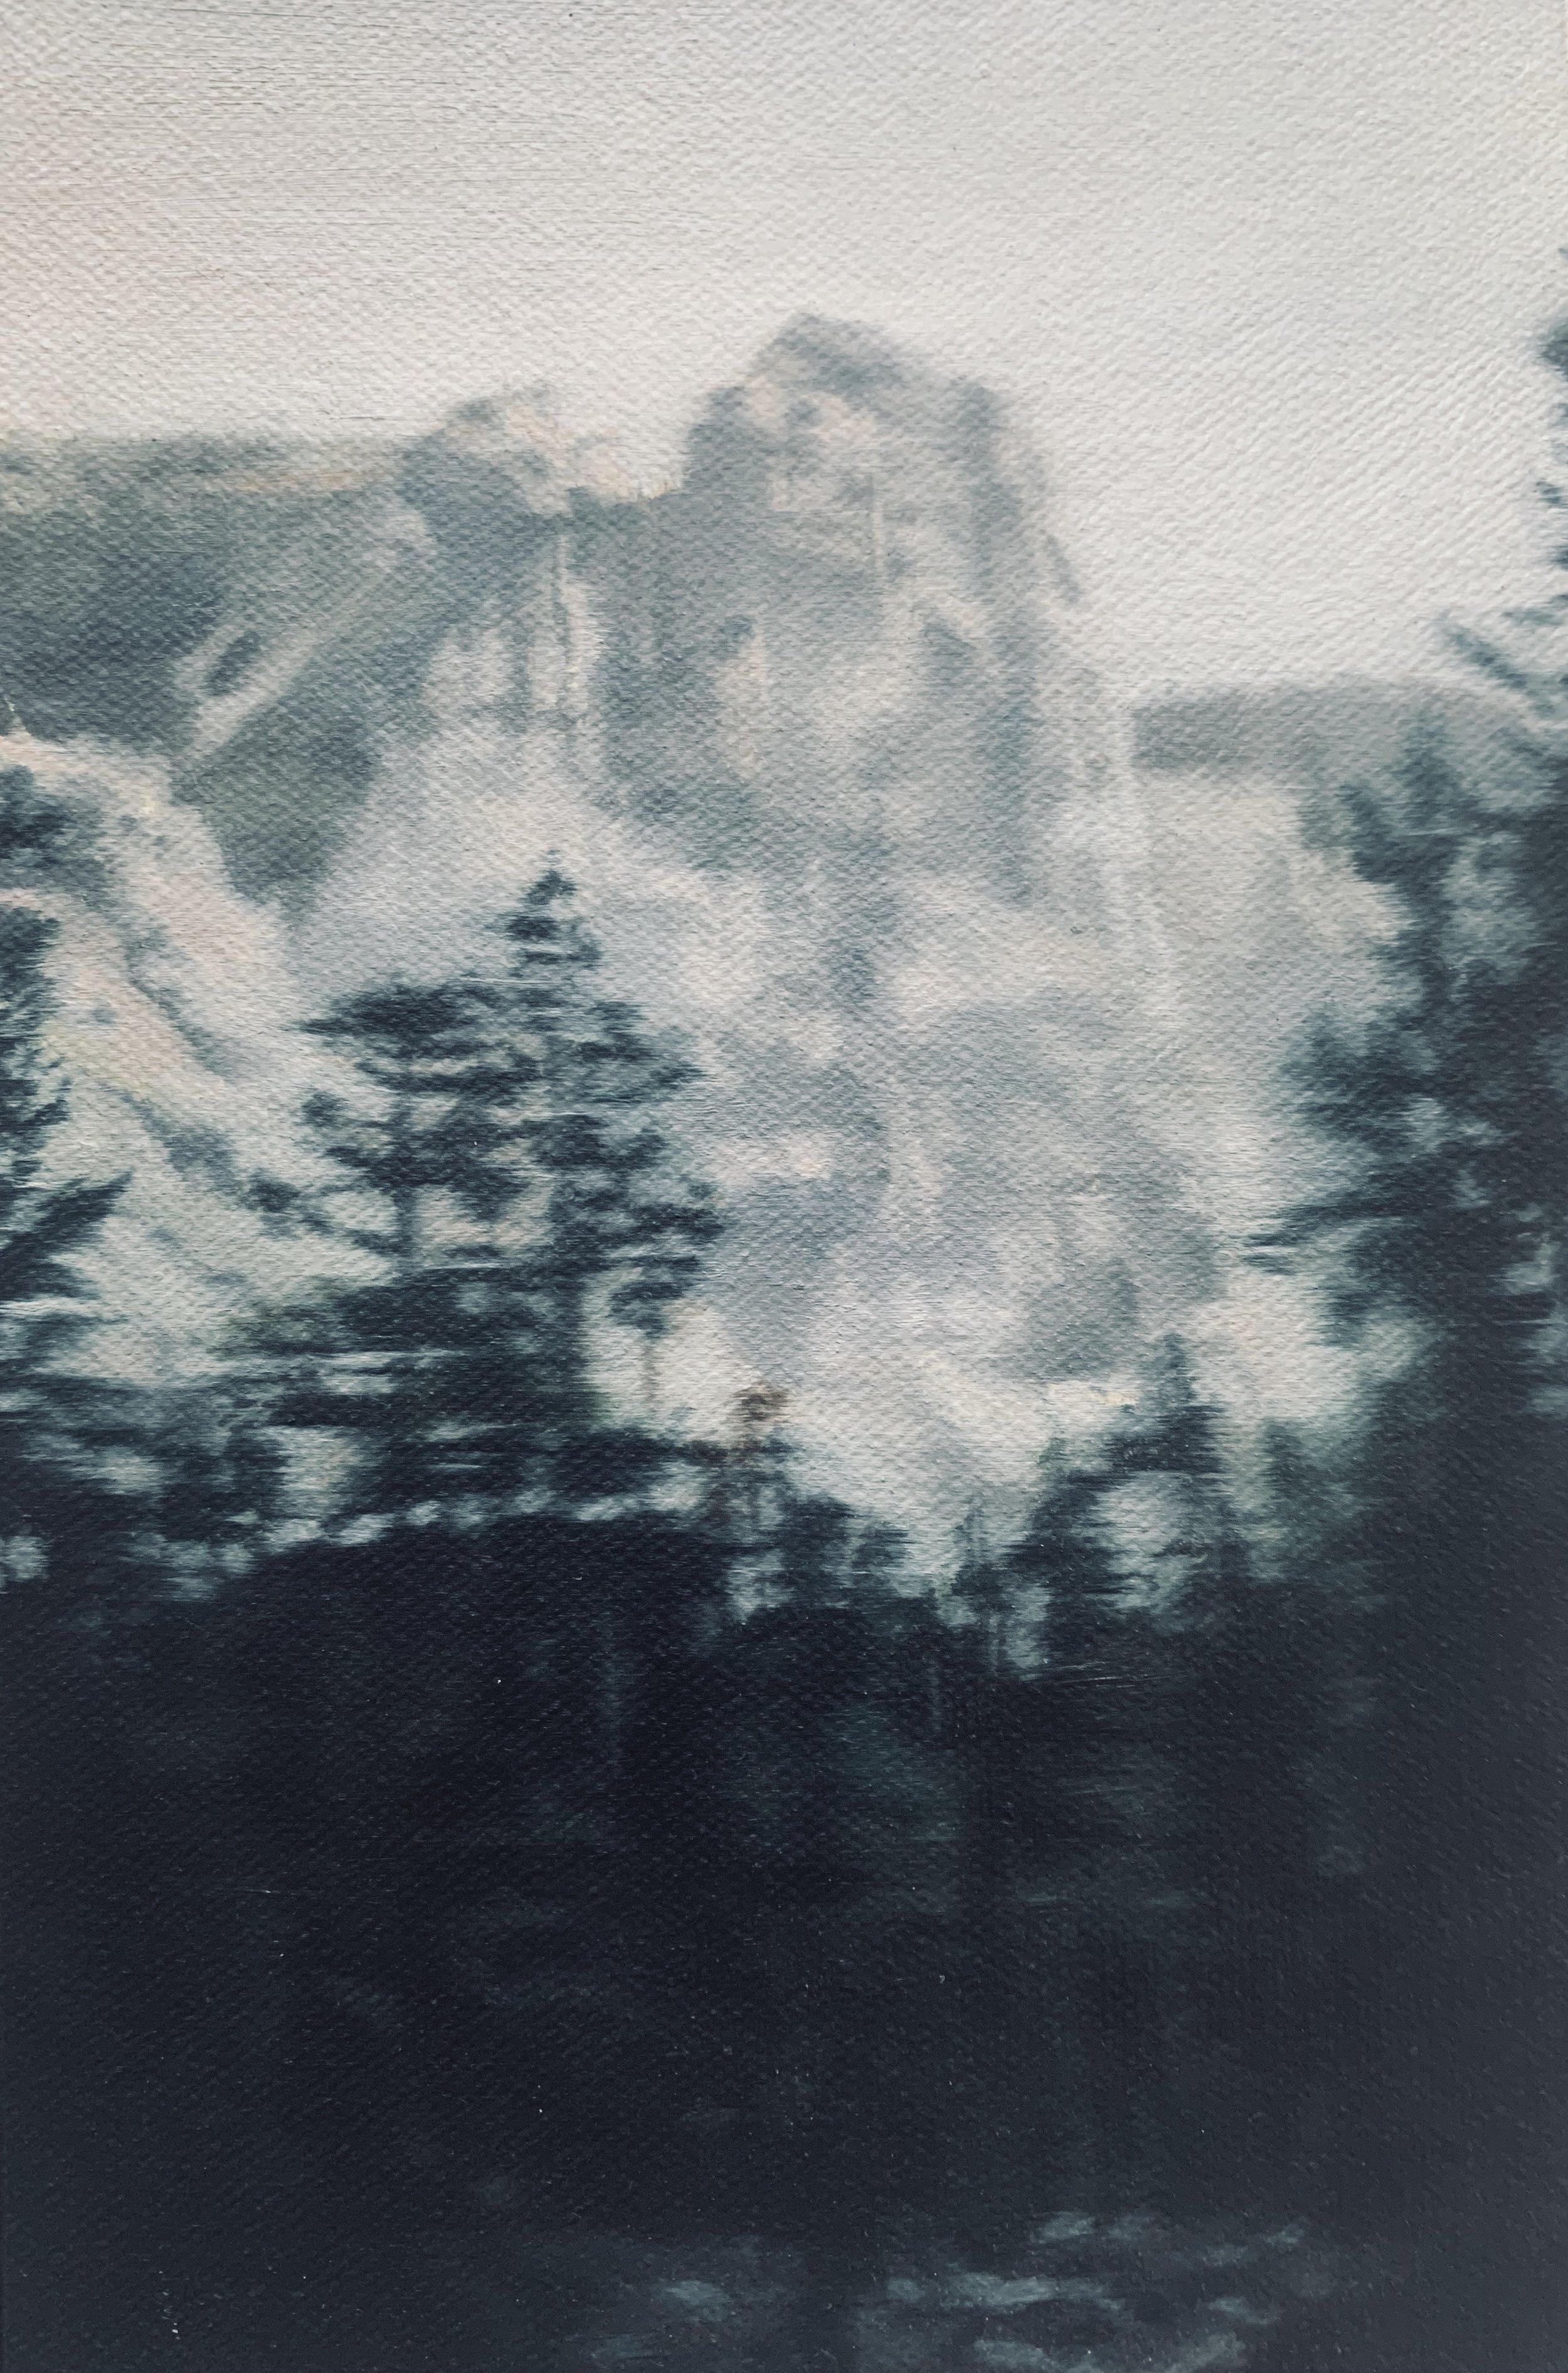 AMELIA CARROLL  image.82,  2019 oil on canvas 18 x 12.5 cm